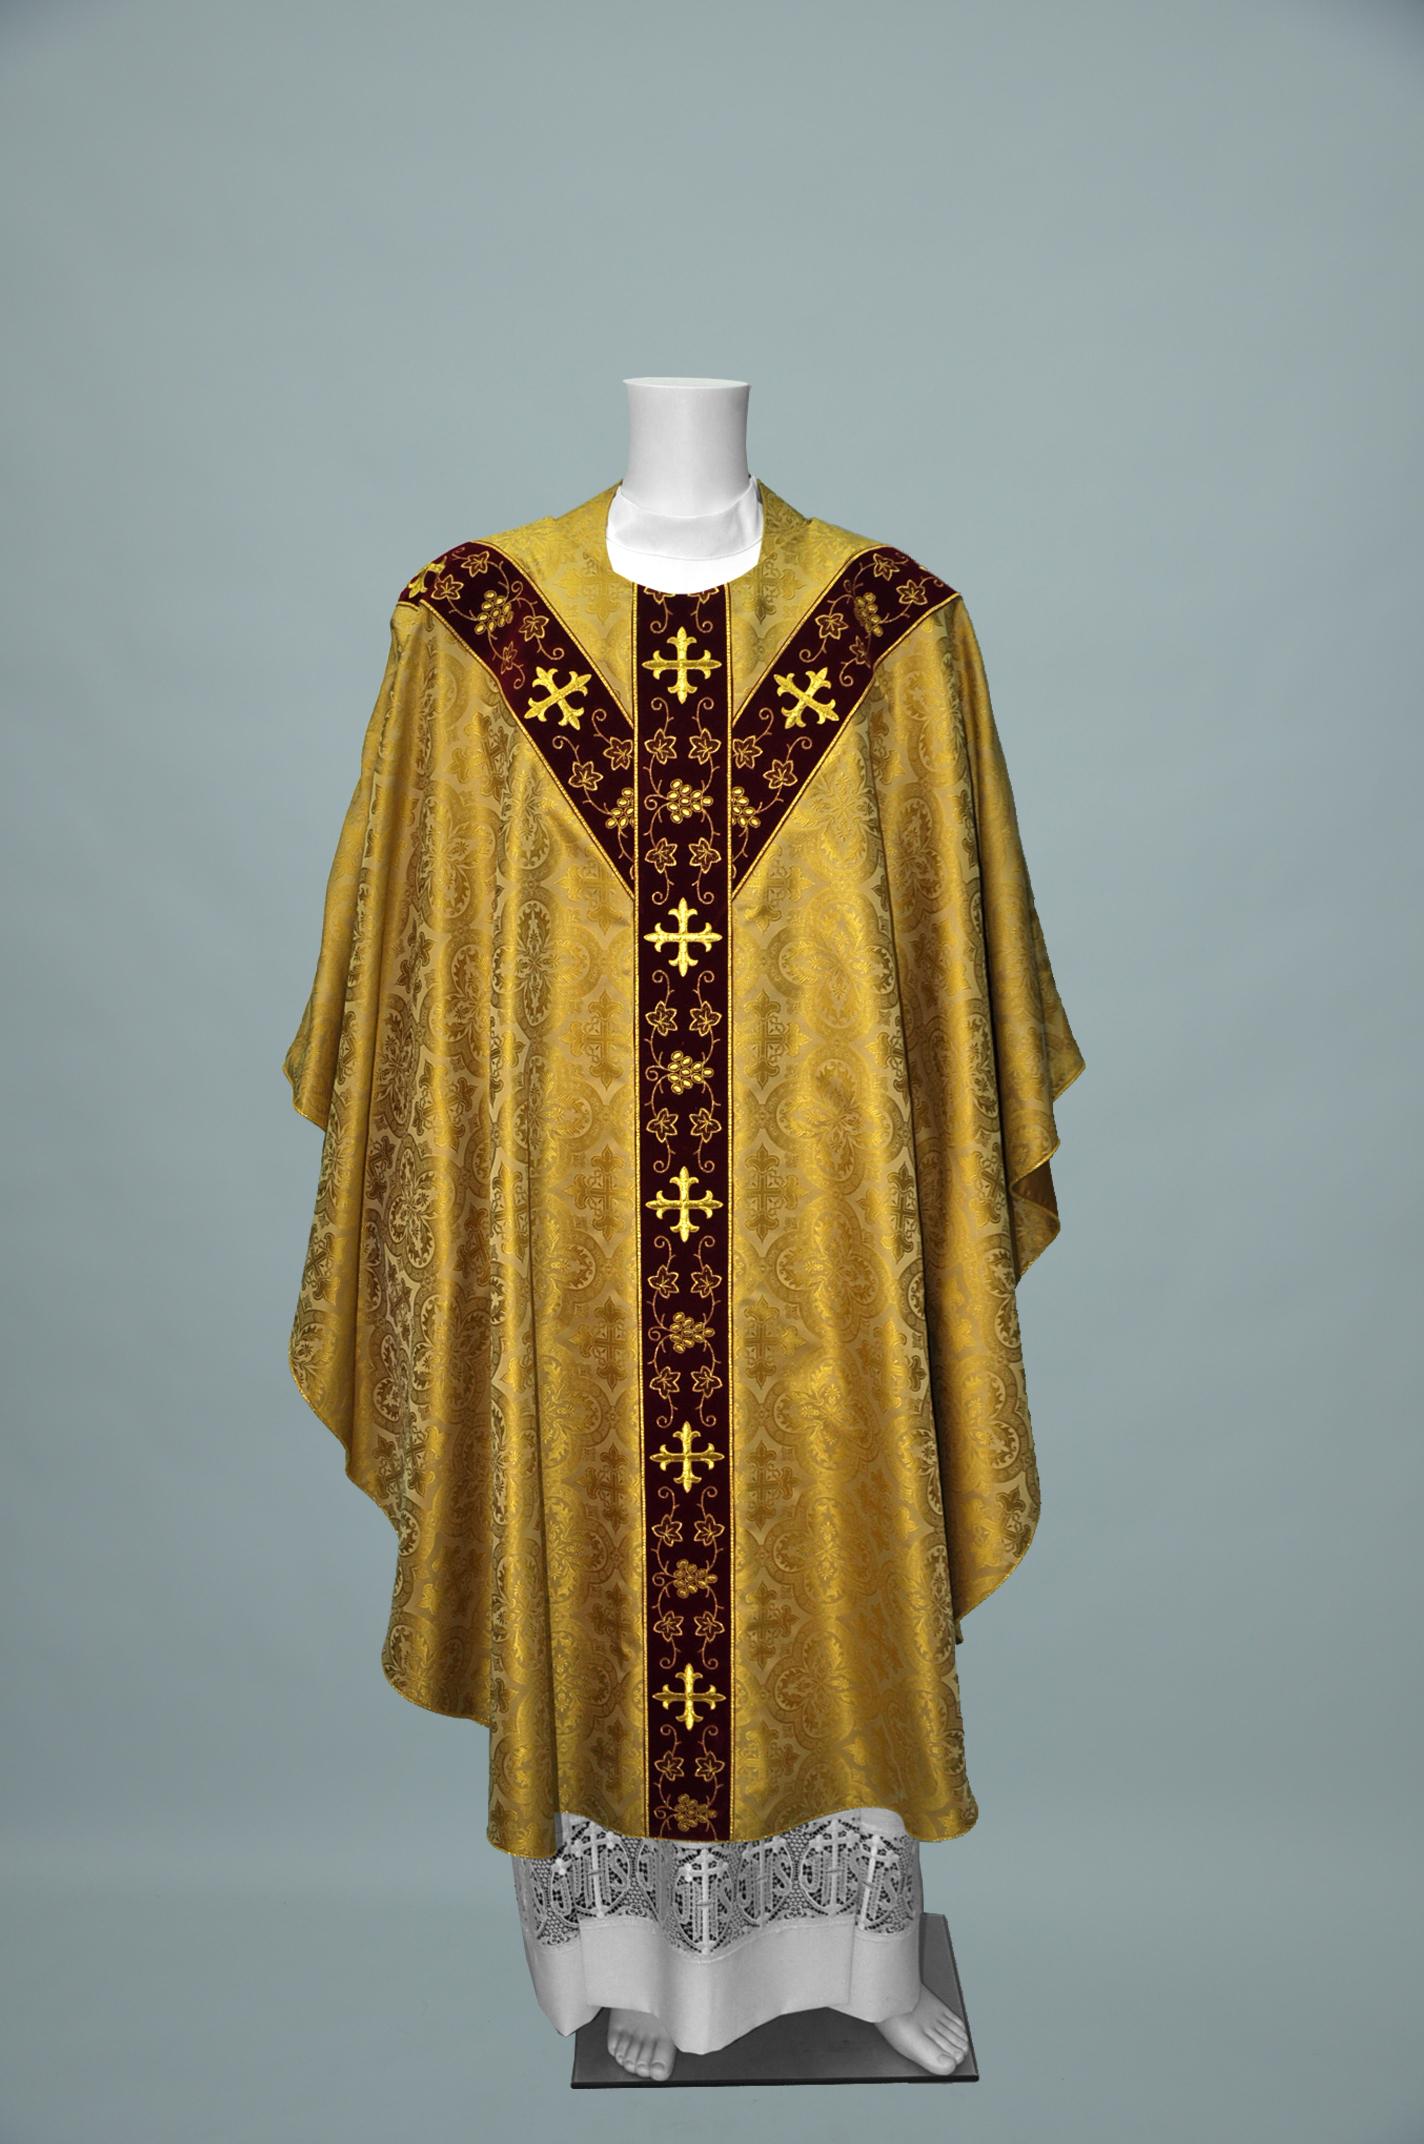 Gothic Chasuble Davinci Gold W R1282 burgundy gold (f) 2.jpg